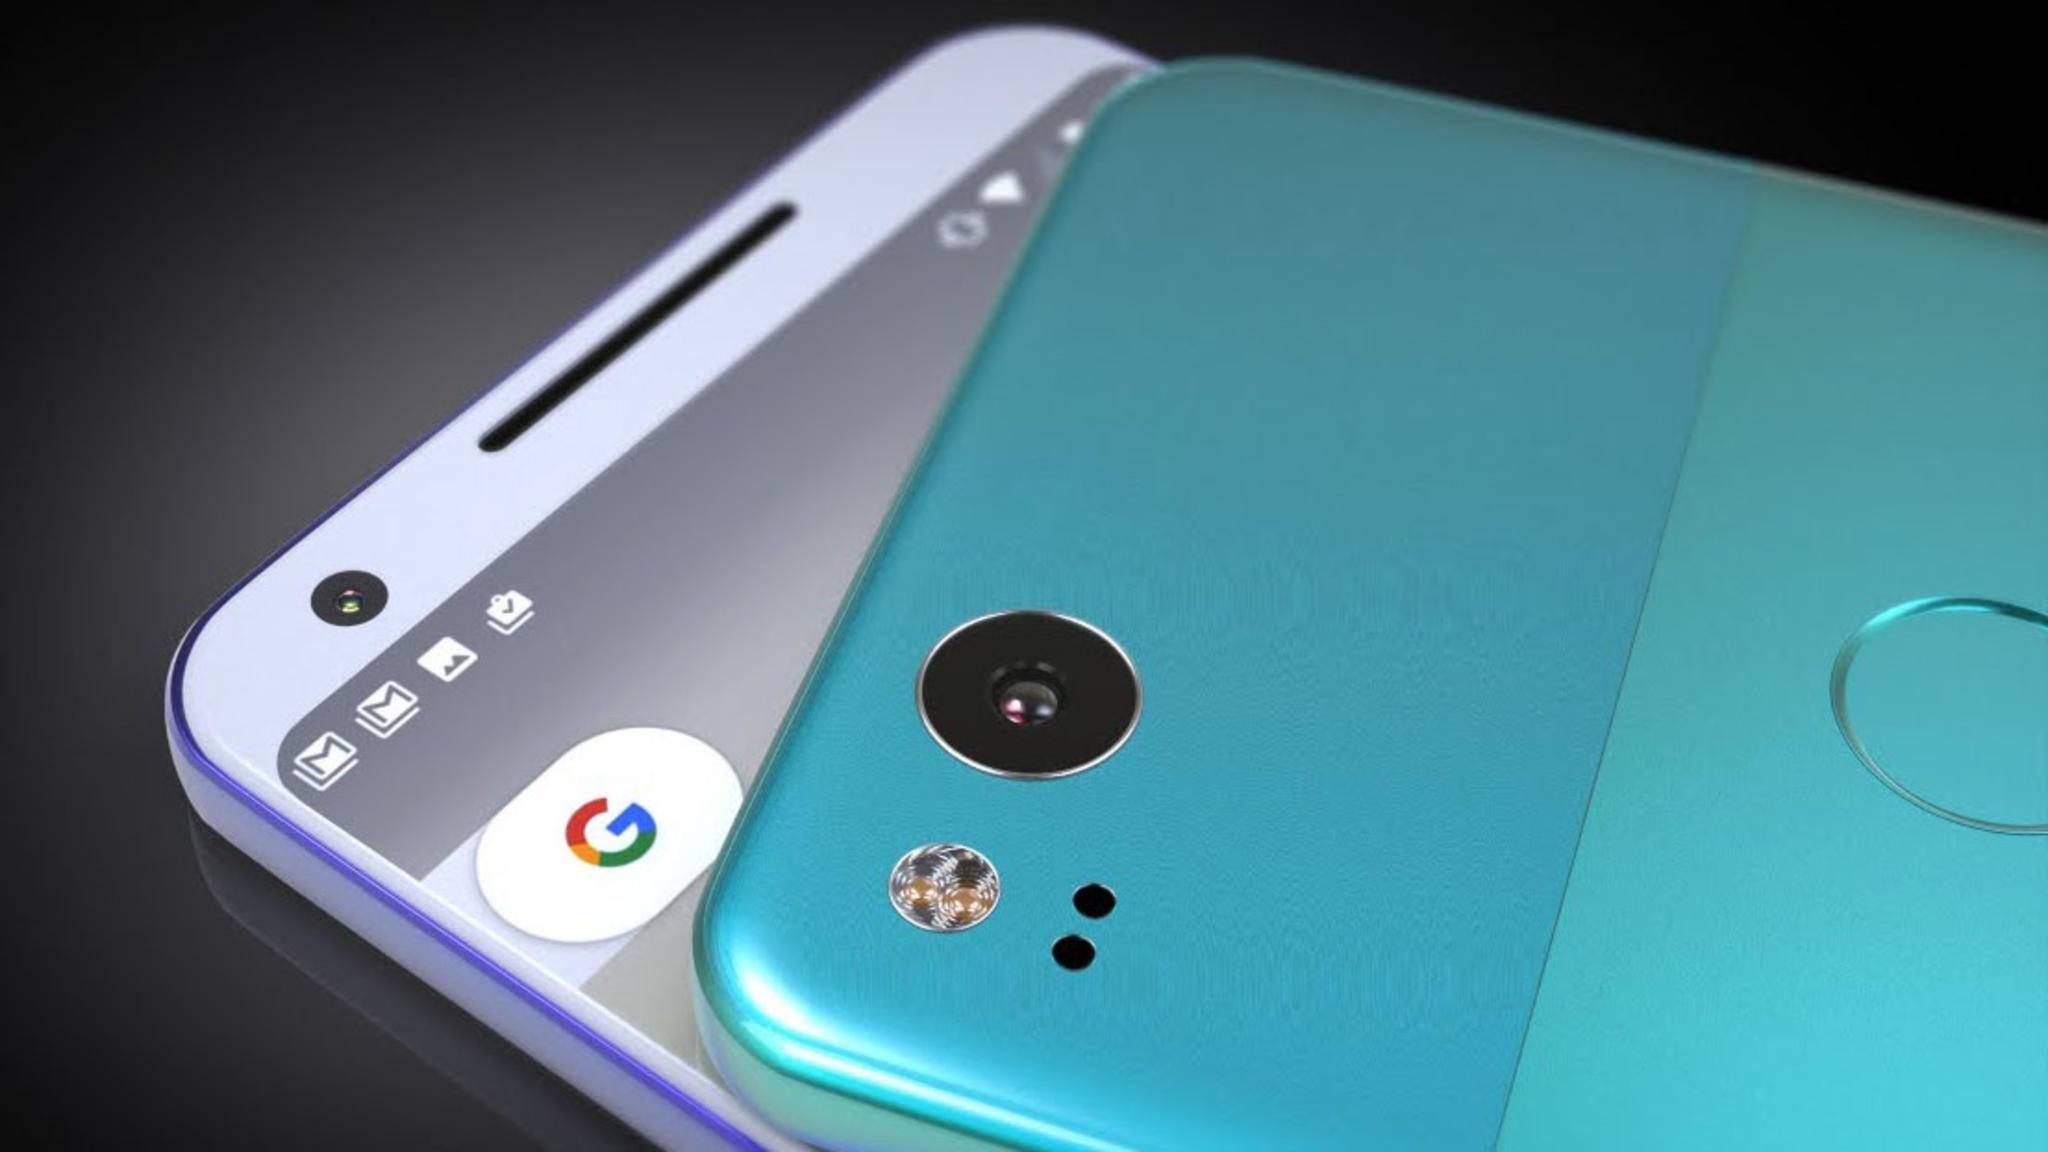 Am 5. Oktober soll das Google Pixel 2 Premiere feiern.